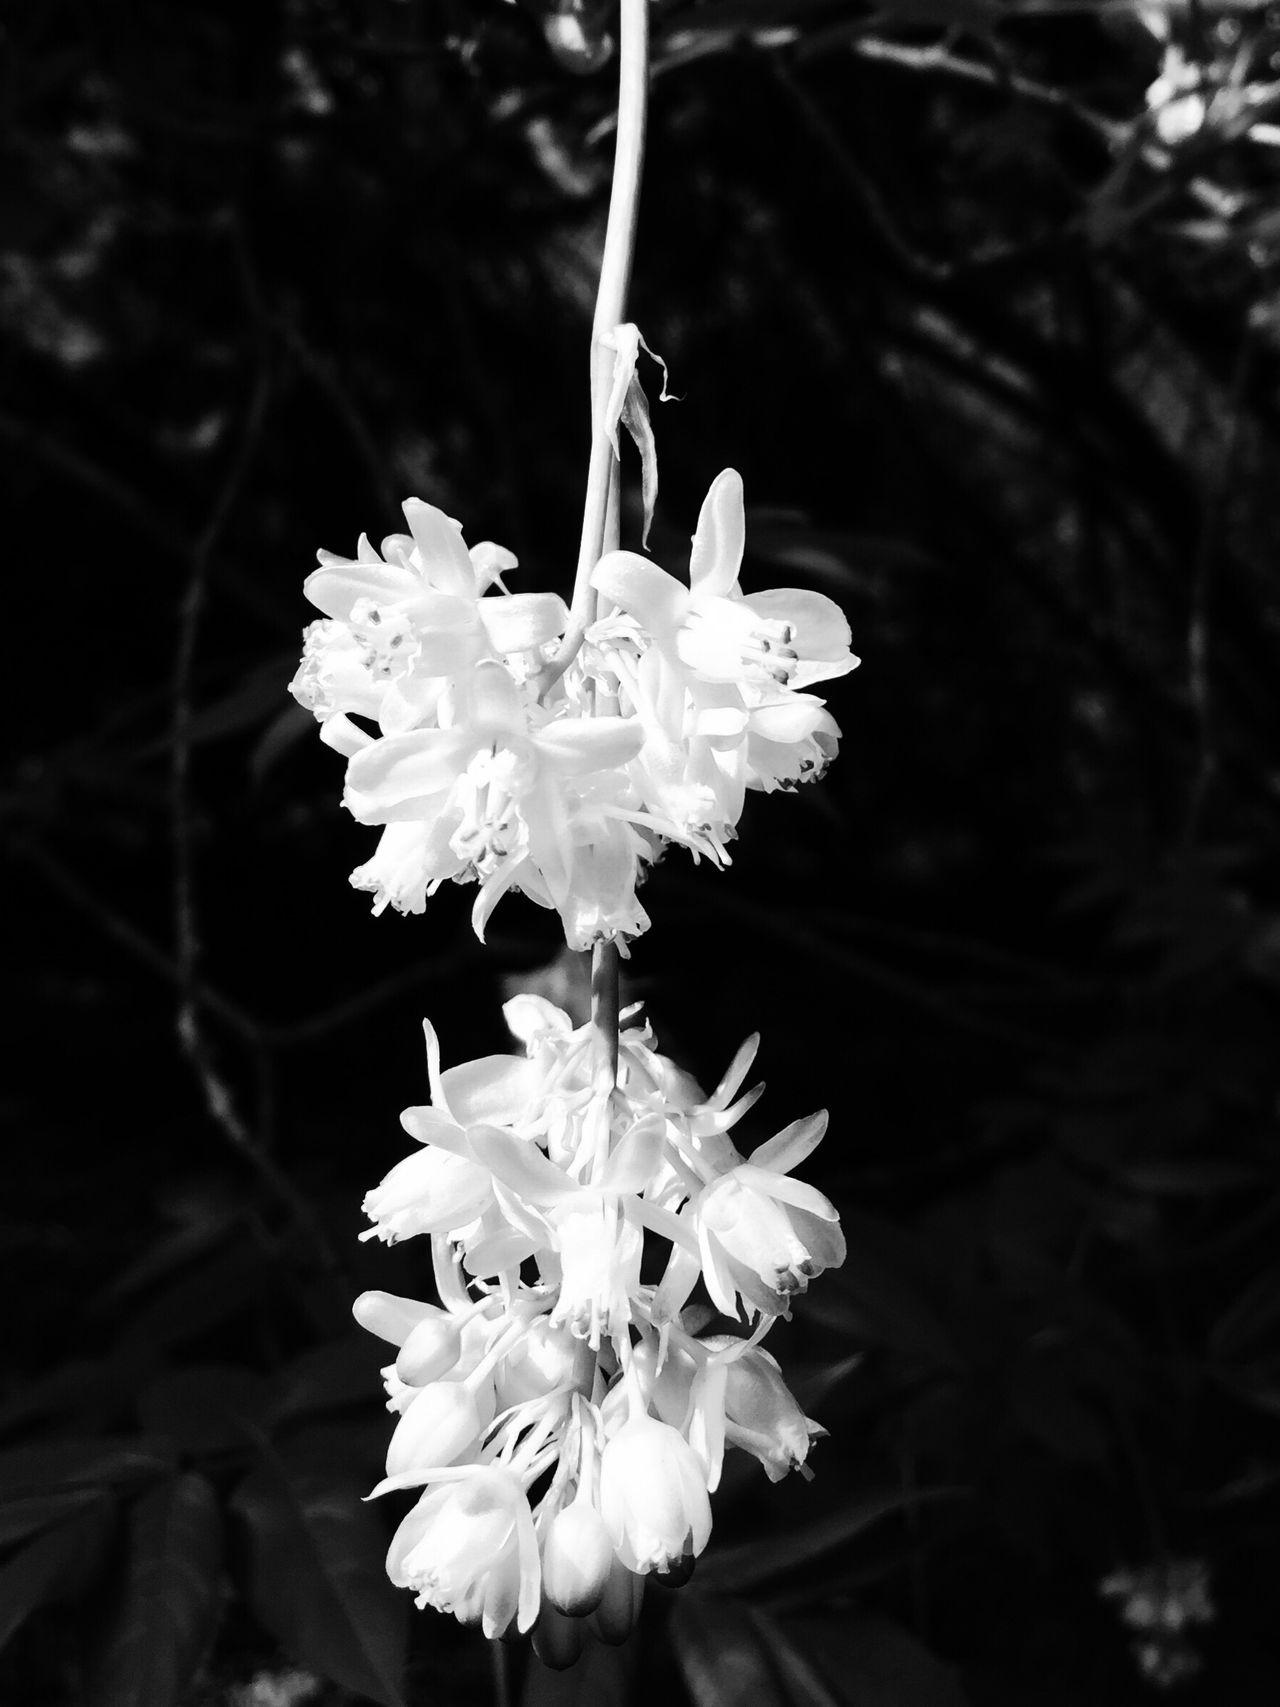 Nature Flower Landscape Noir Blackandwhite Outdoors Taking Photos OpenEdit VSCO IPhoneography